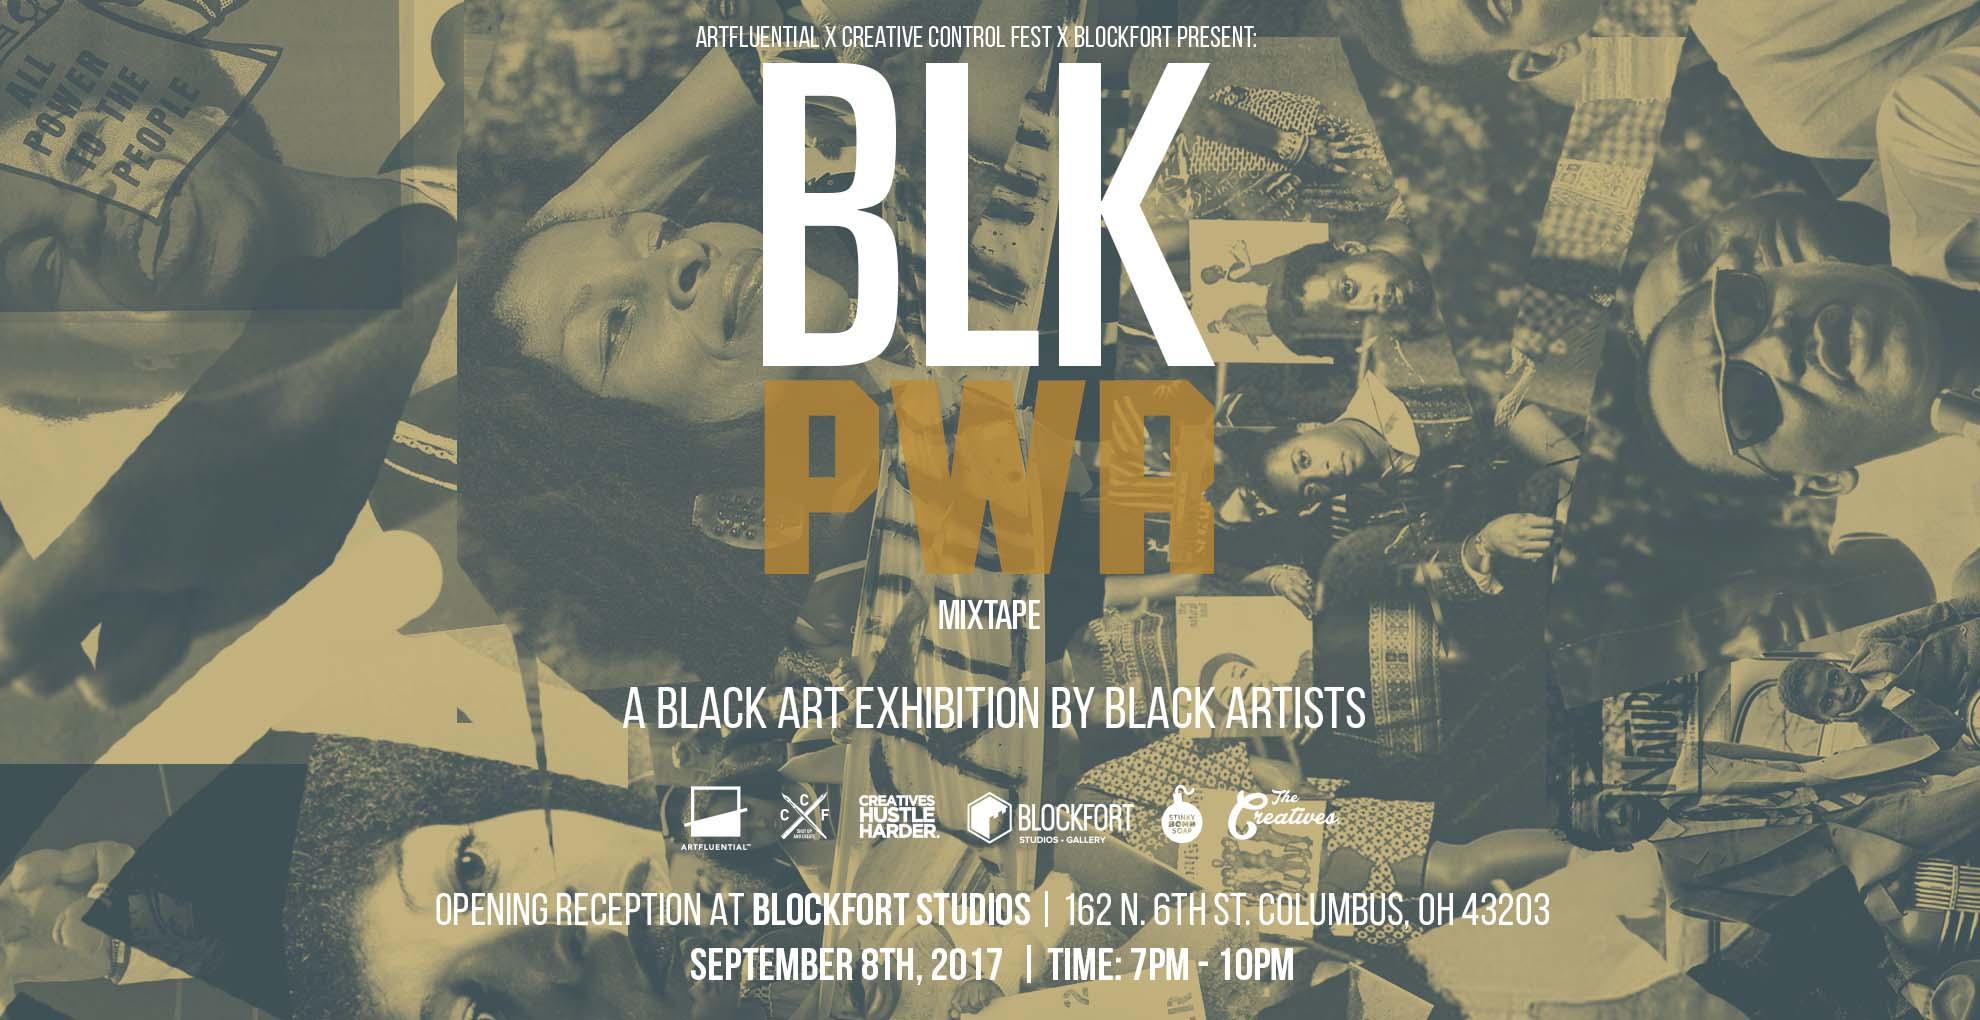 BPM-Facebook-Event-image-1.jpg